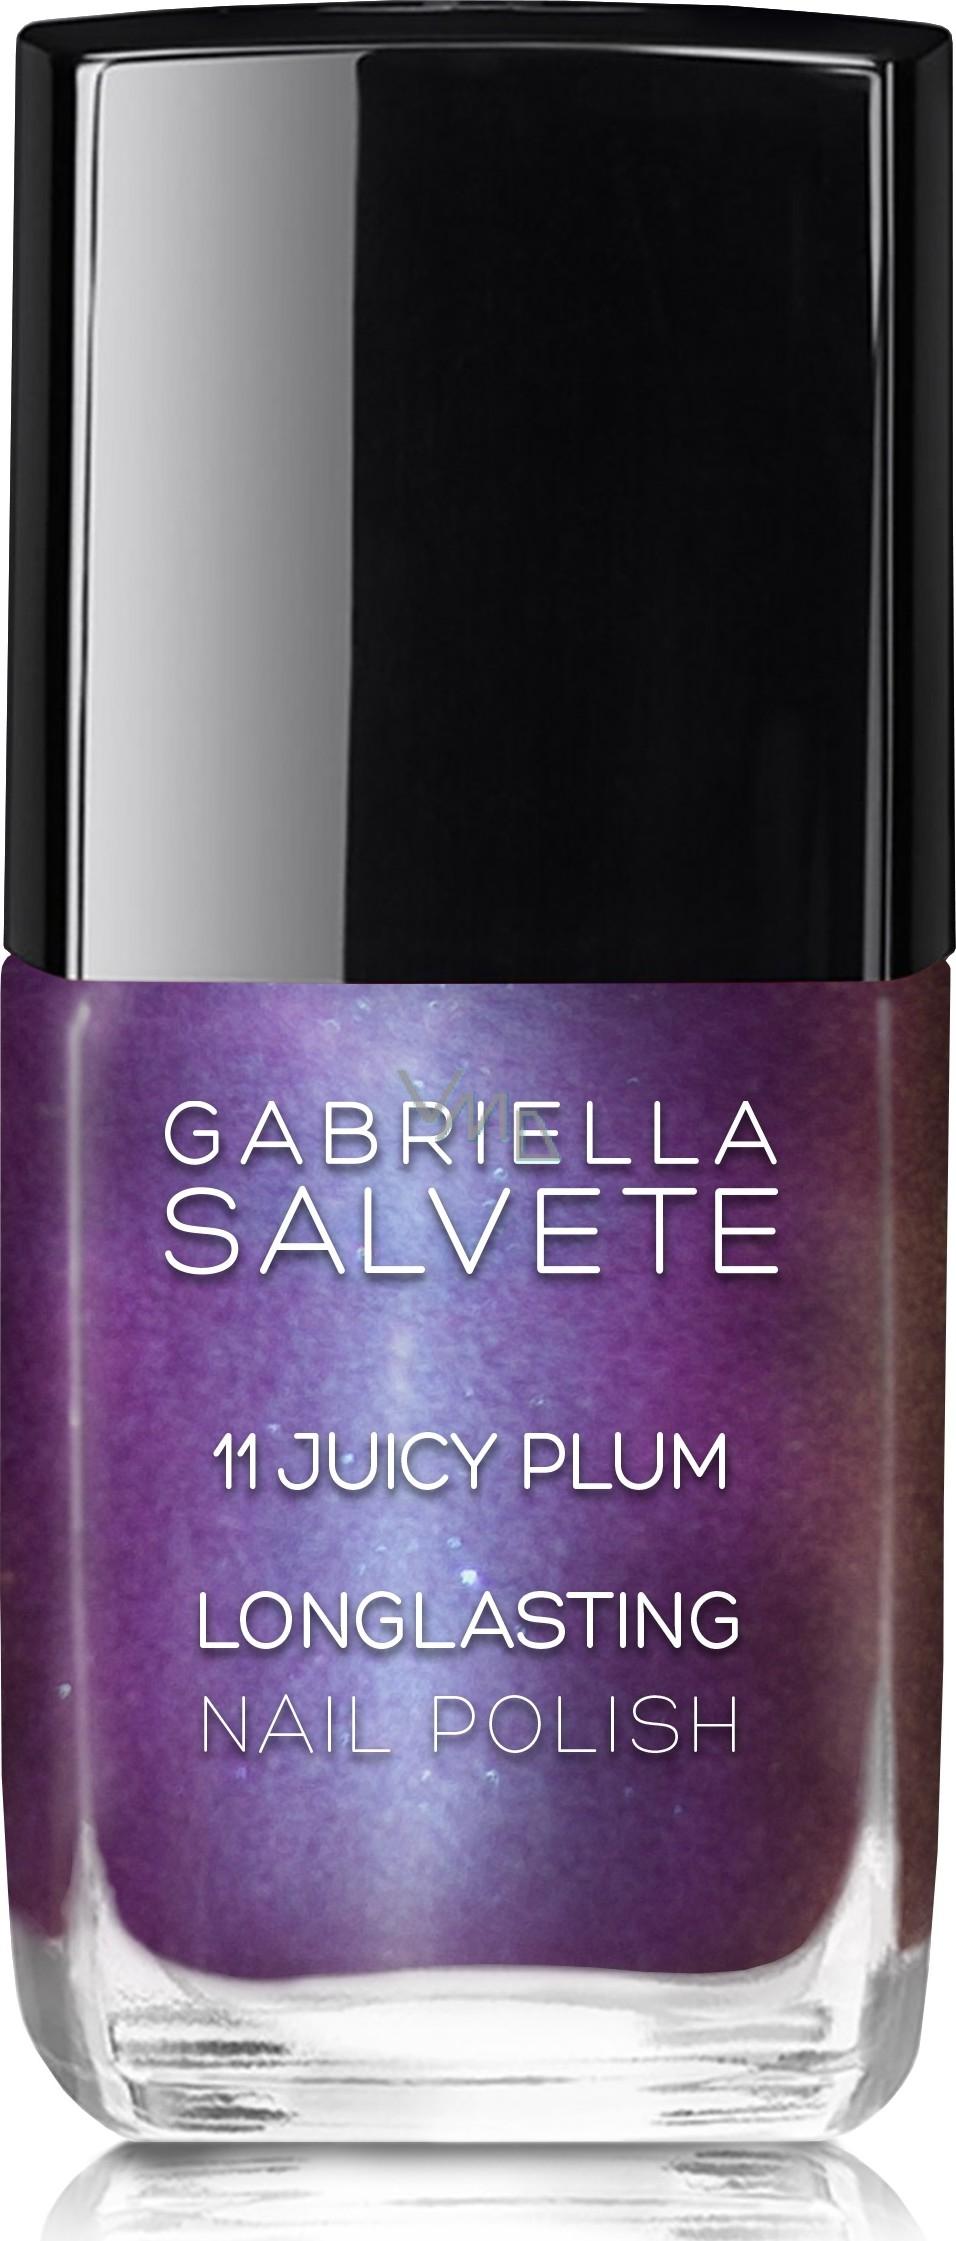 Gabriella Salvete Long Lasting Nail Polish Nail And Manicure Trends